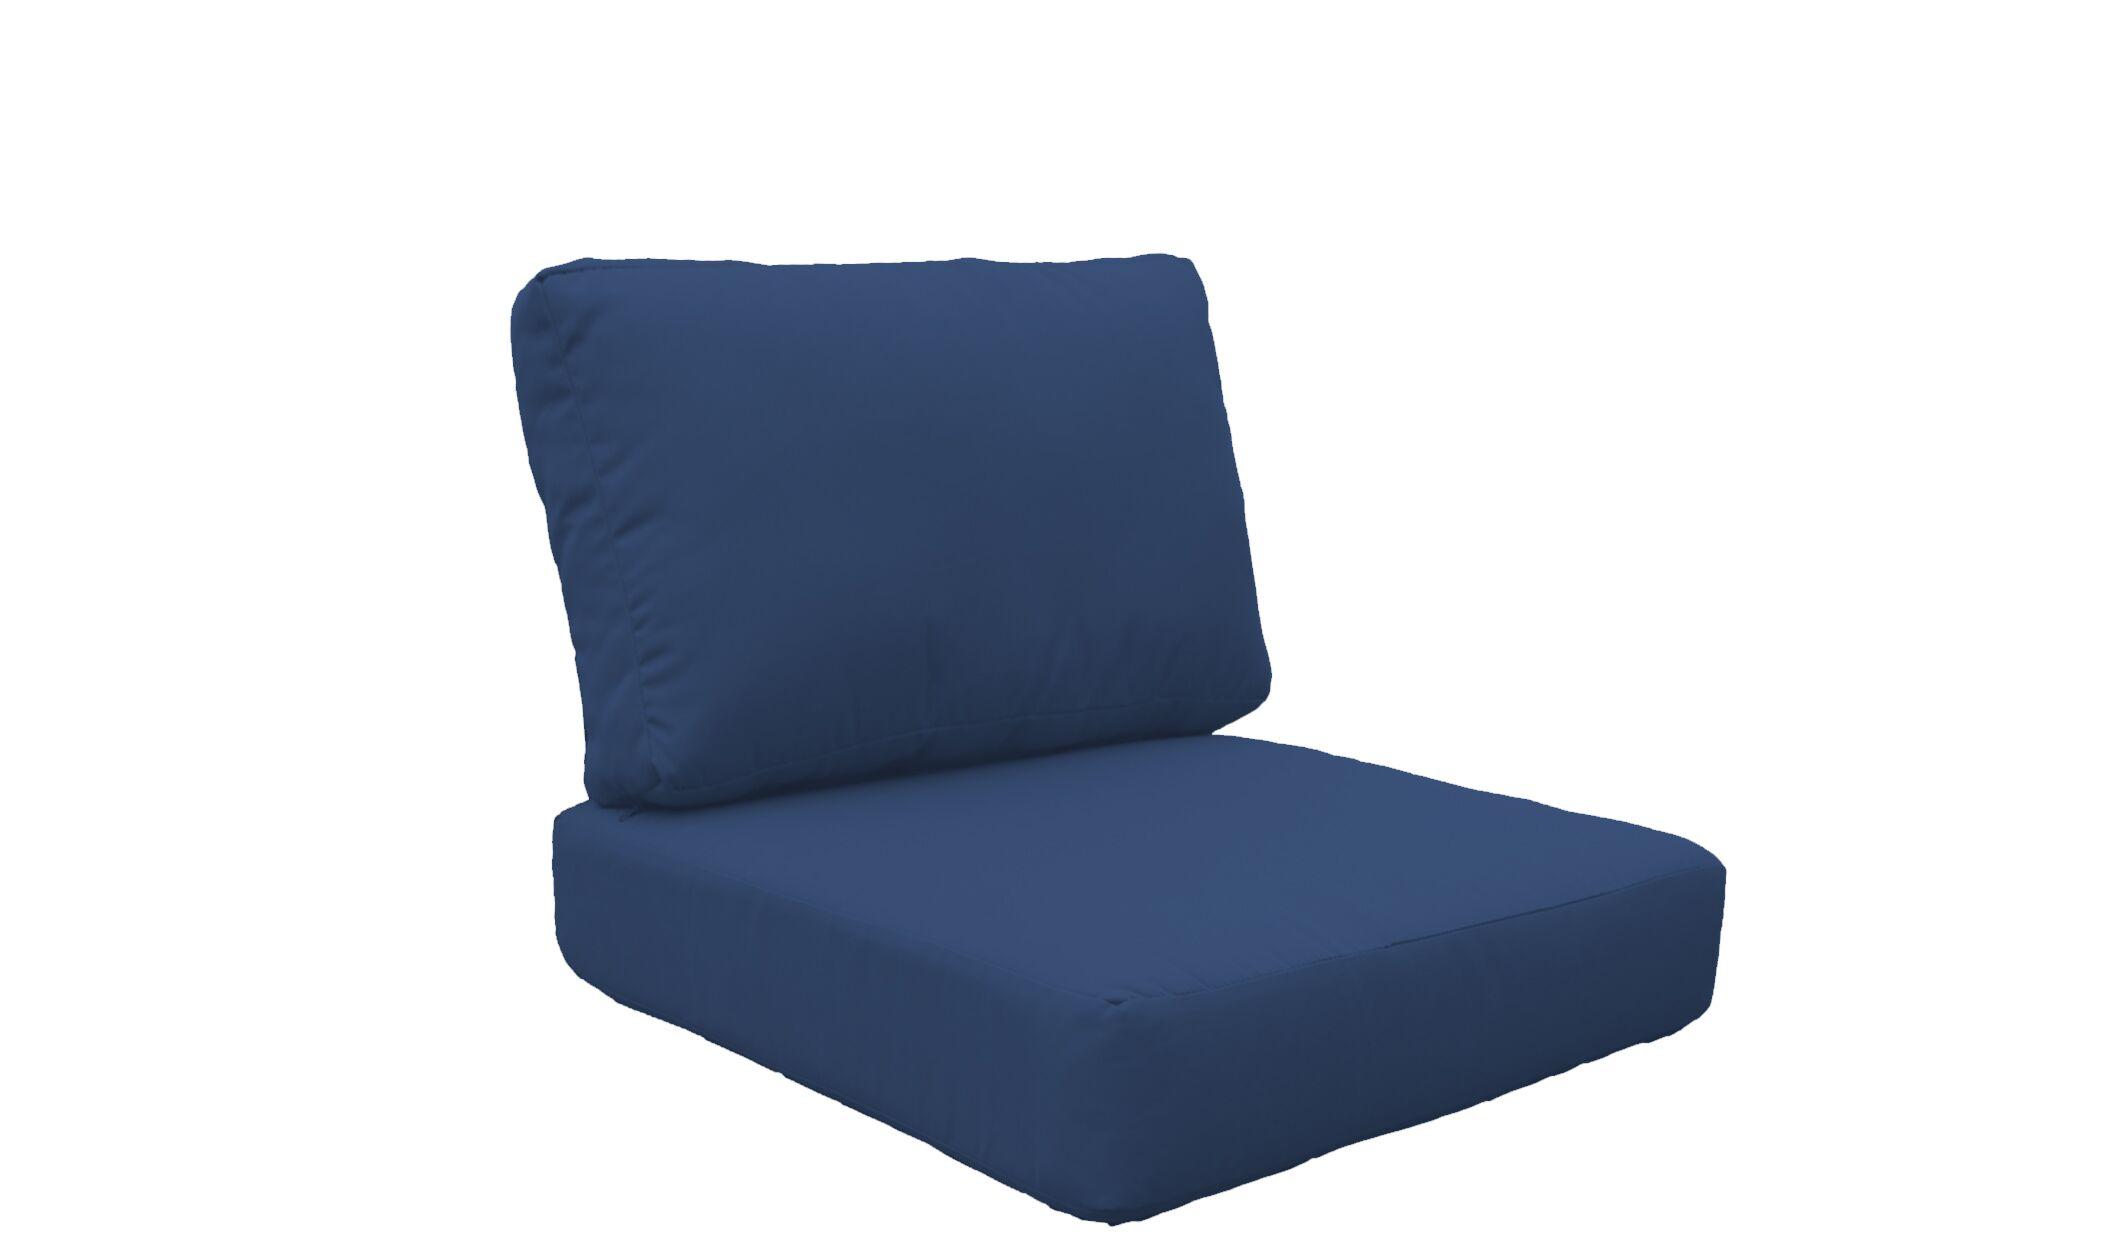 Fairmont 4 Piece Outdoor�Lounge Chair Cushion Set Fabric: Navy